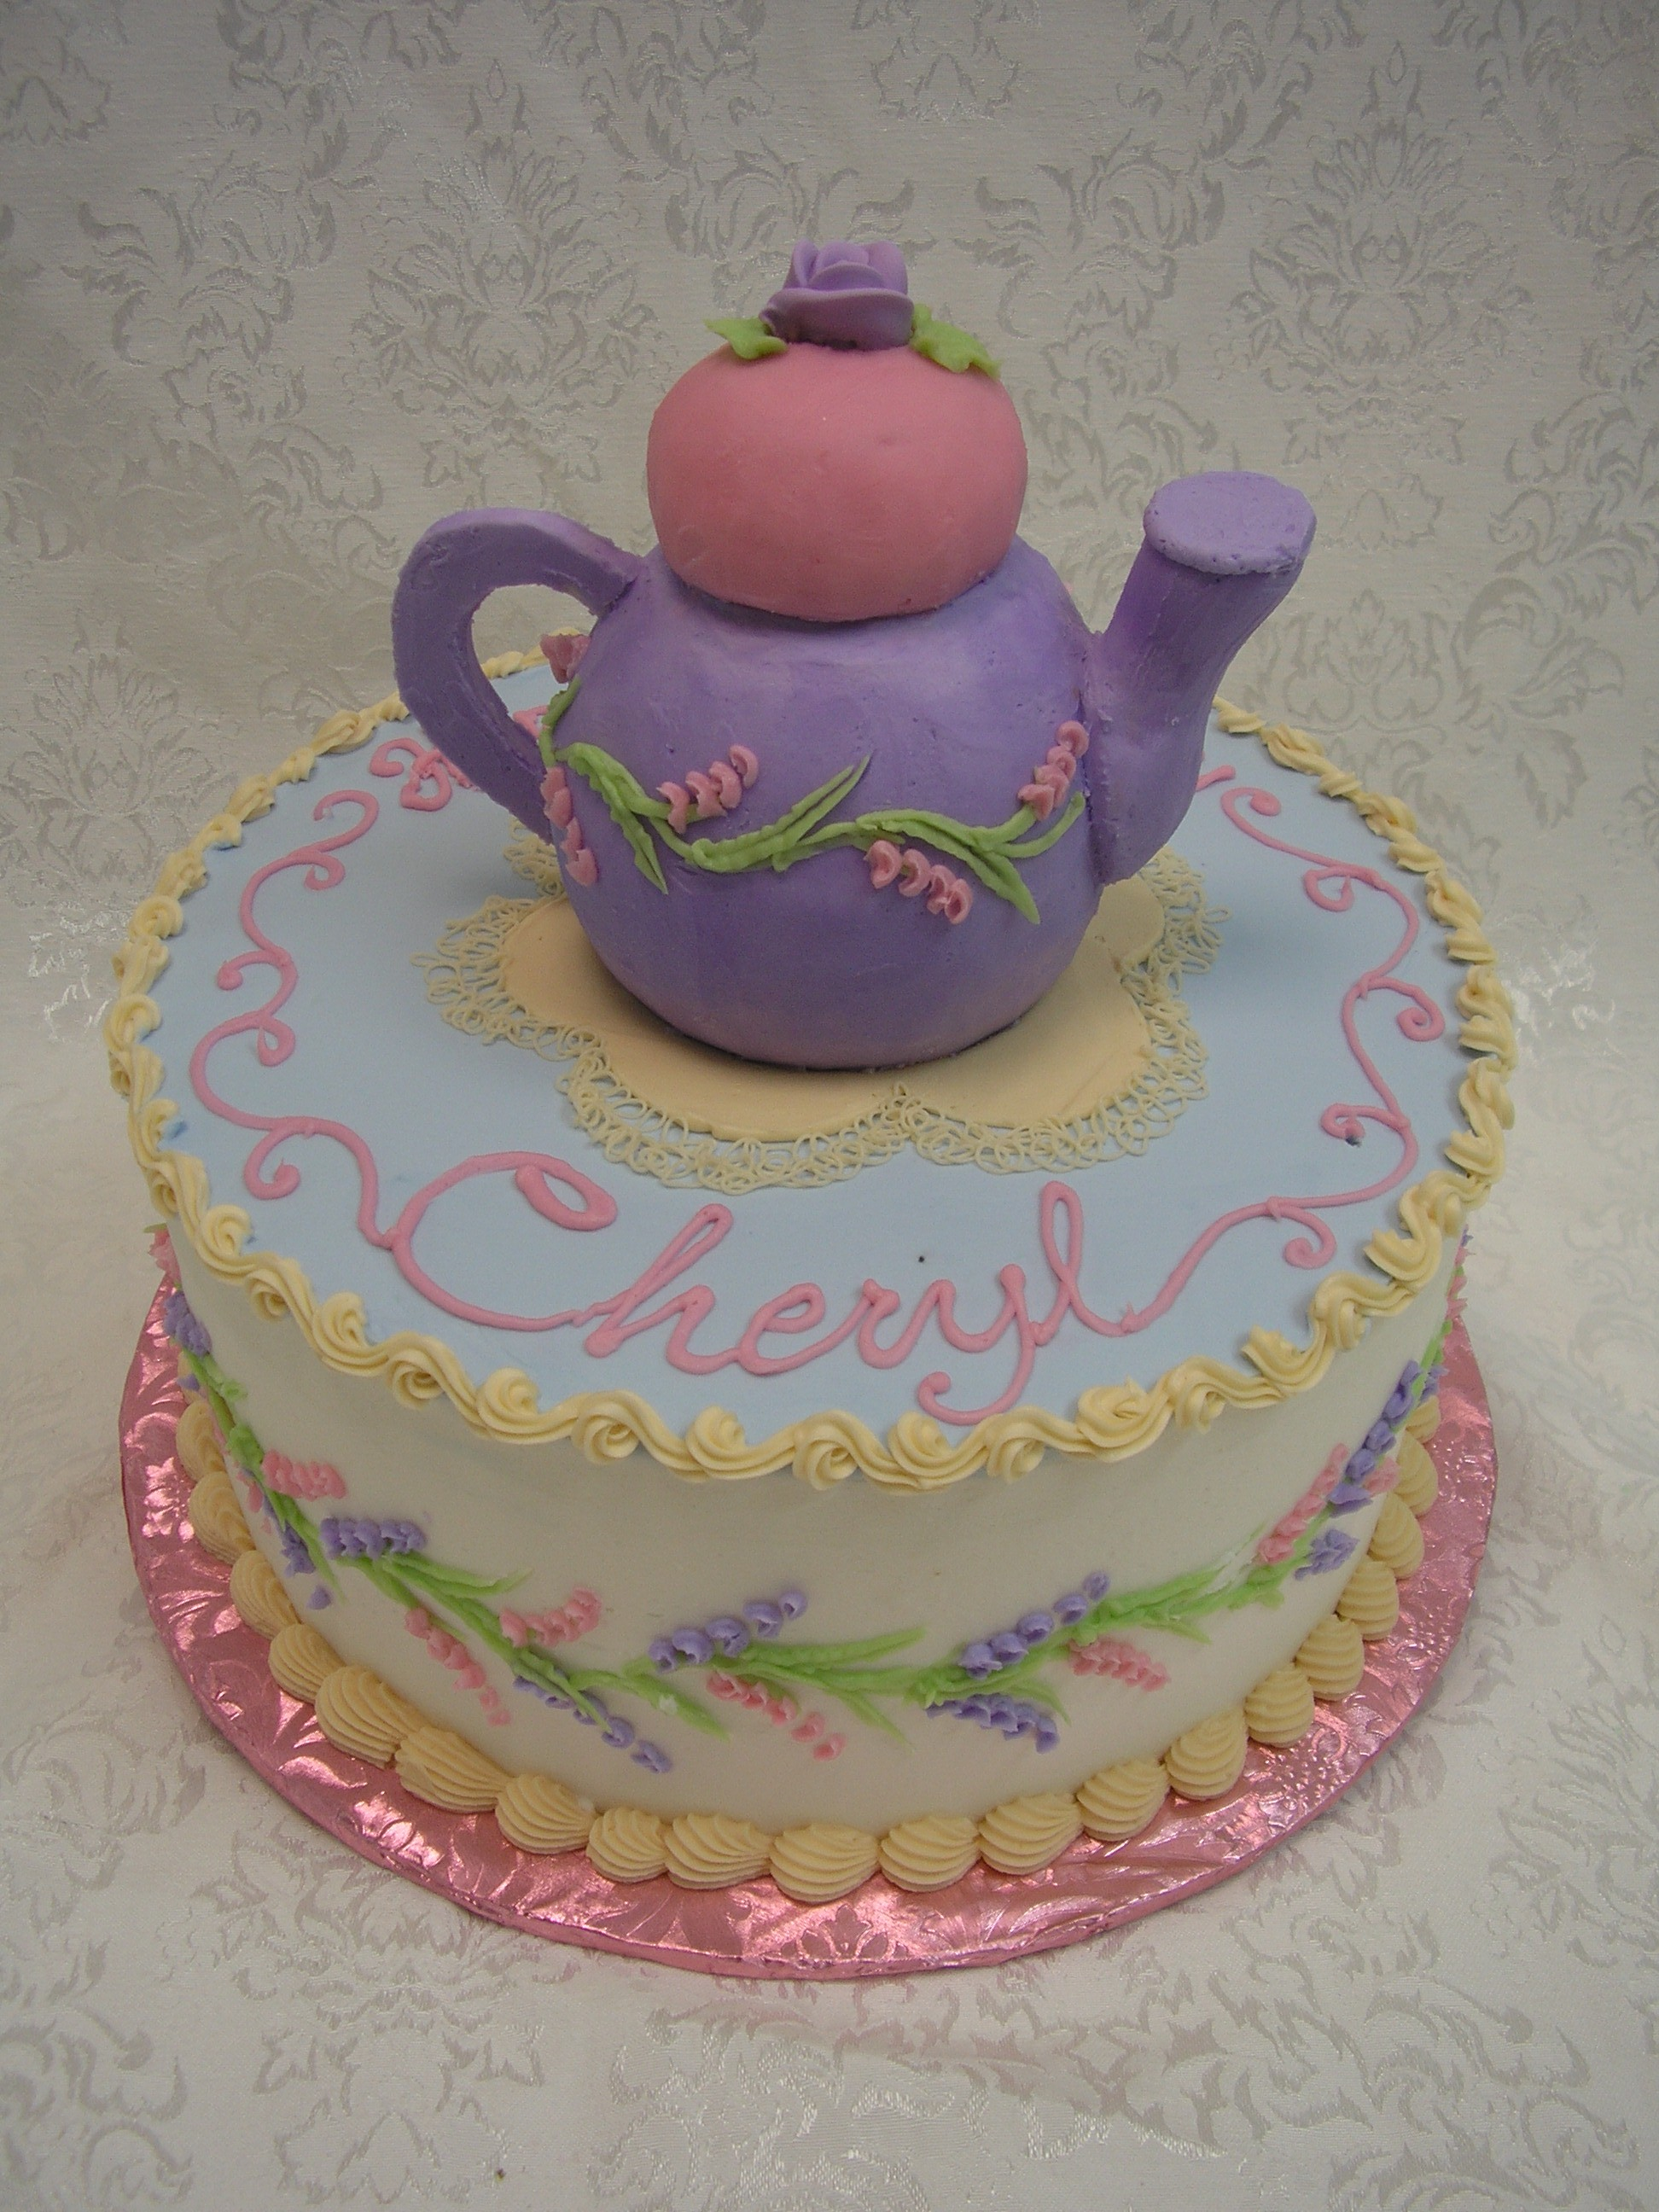 3D teapot on cake